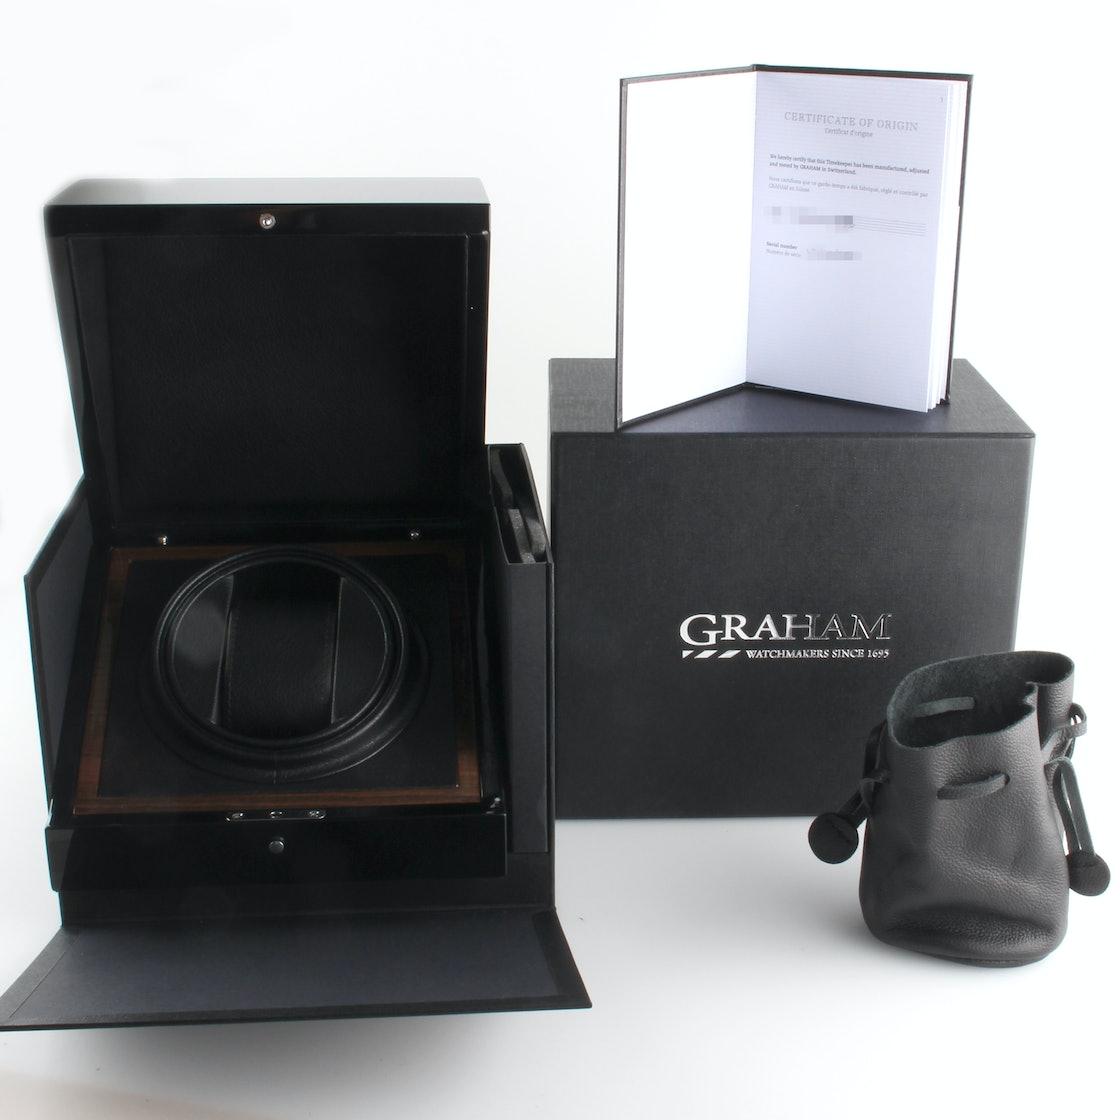 Graham Silverstone RS GMT 2STDC.B08B.K105S